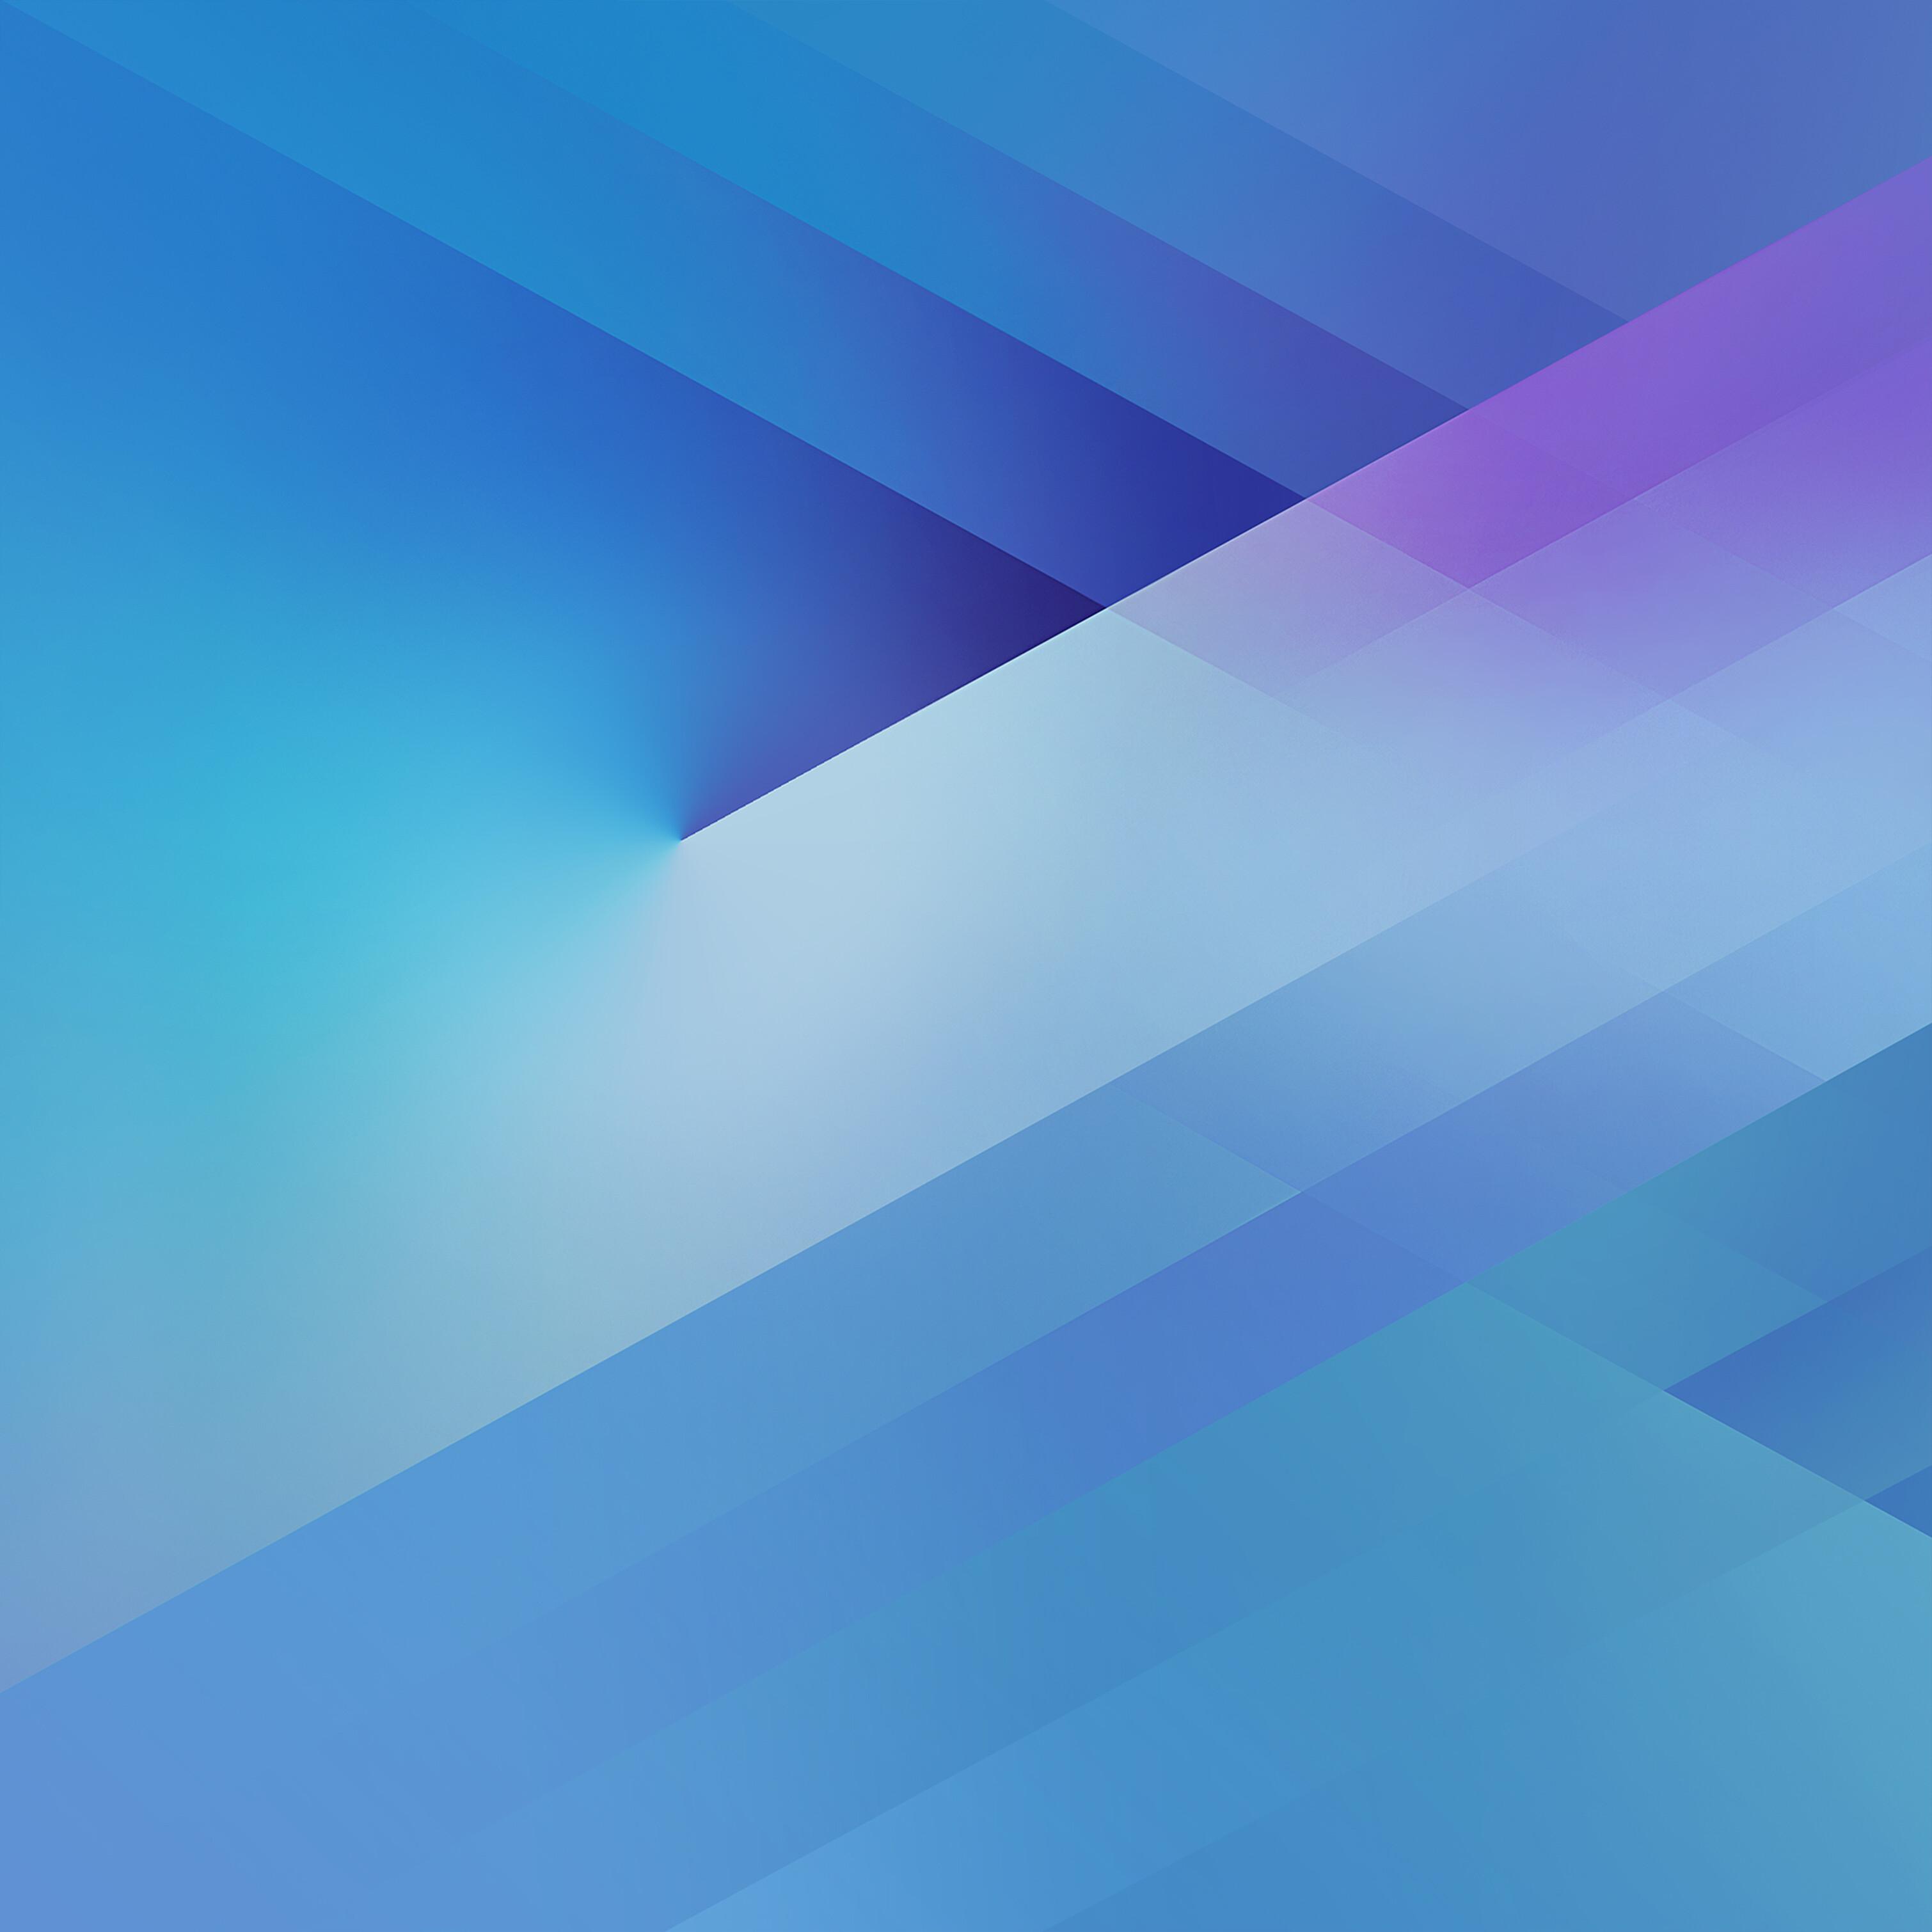 samsung j7 wallpapers hd download